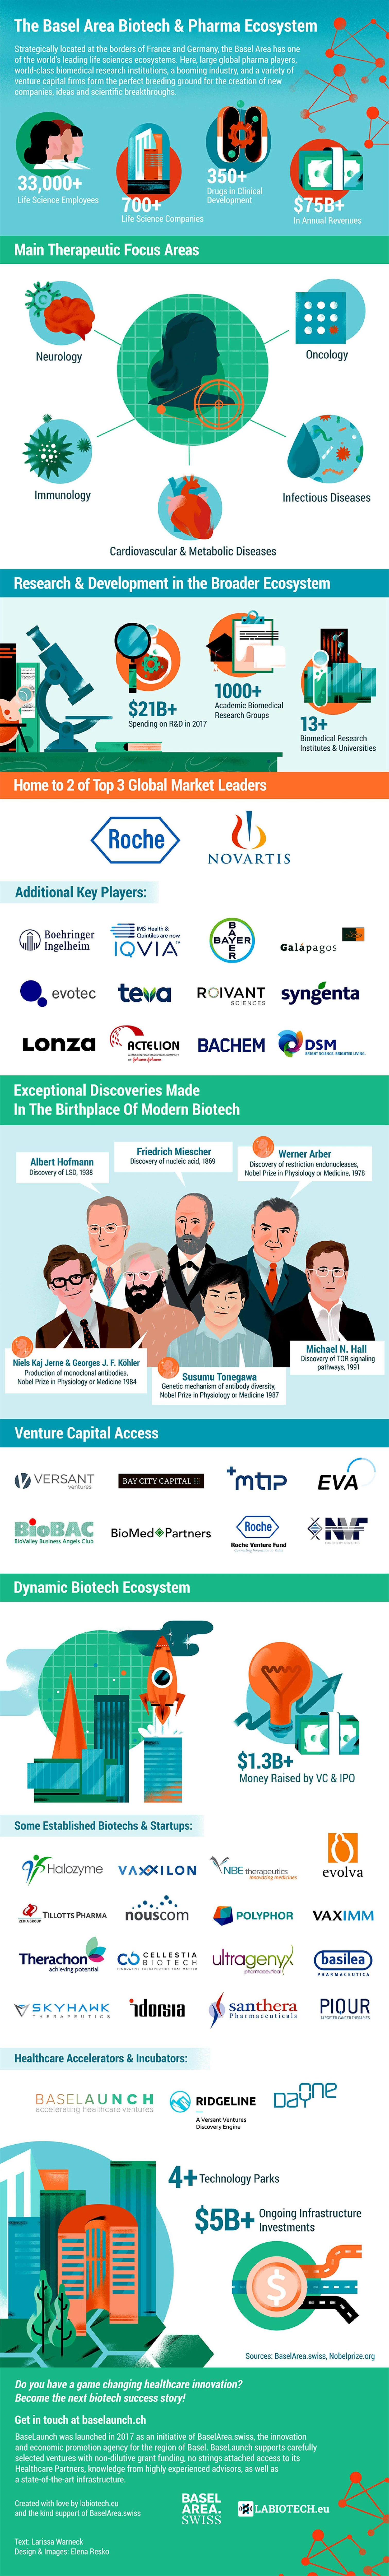 The Basel Biotech & Pharma Ecosystem